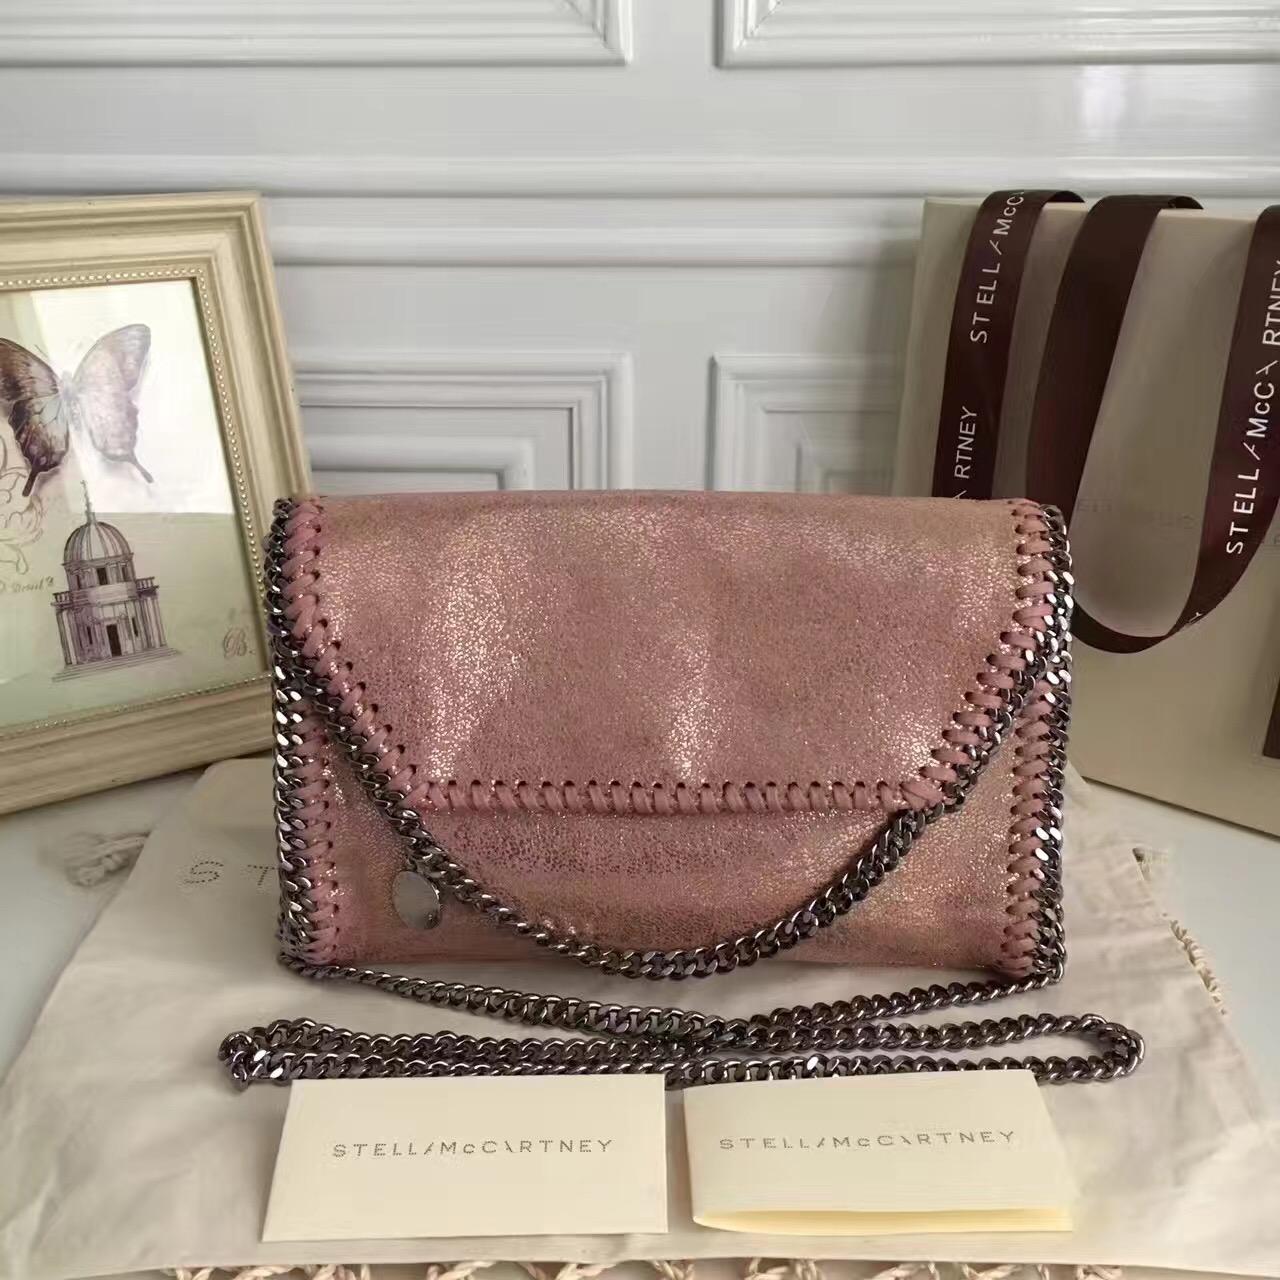 26244a56af58 Stella McCartney Falabella Shaggy Deer Mini Bag Metallic Pink ...